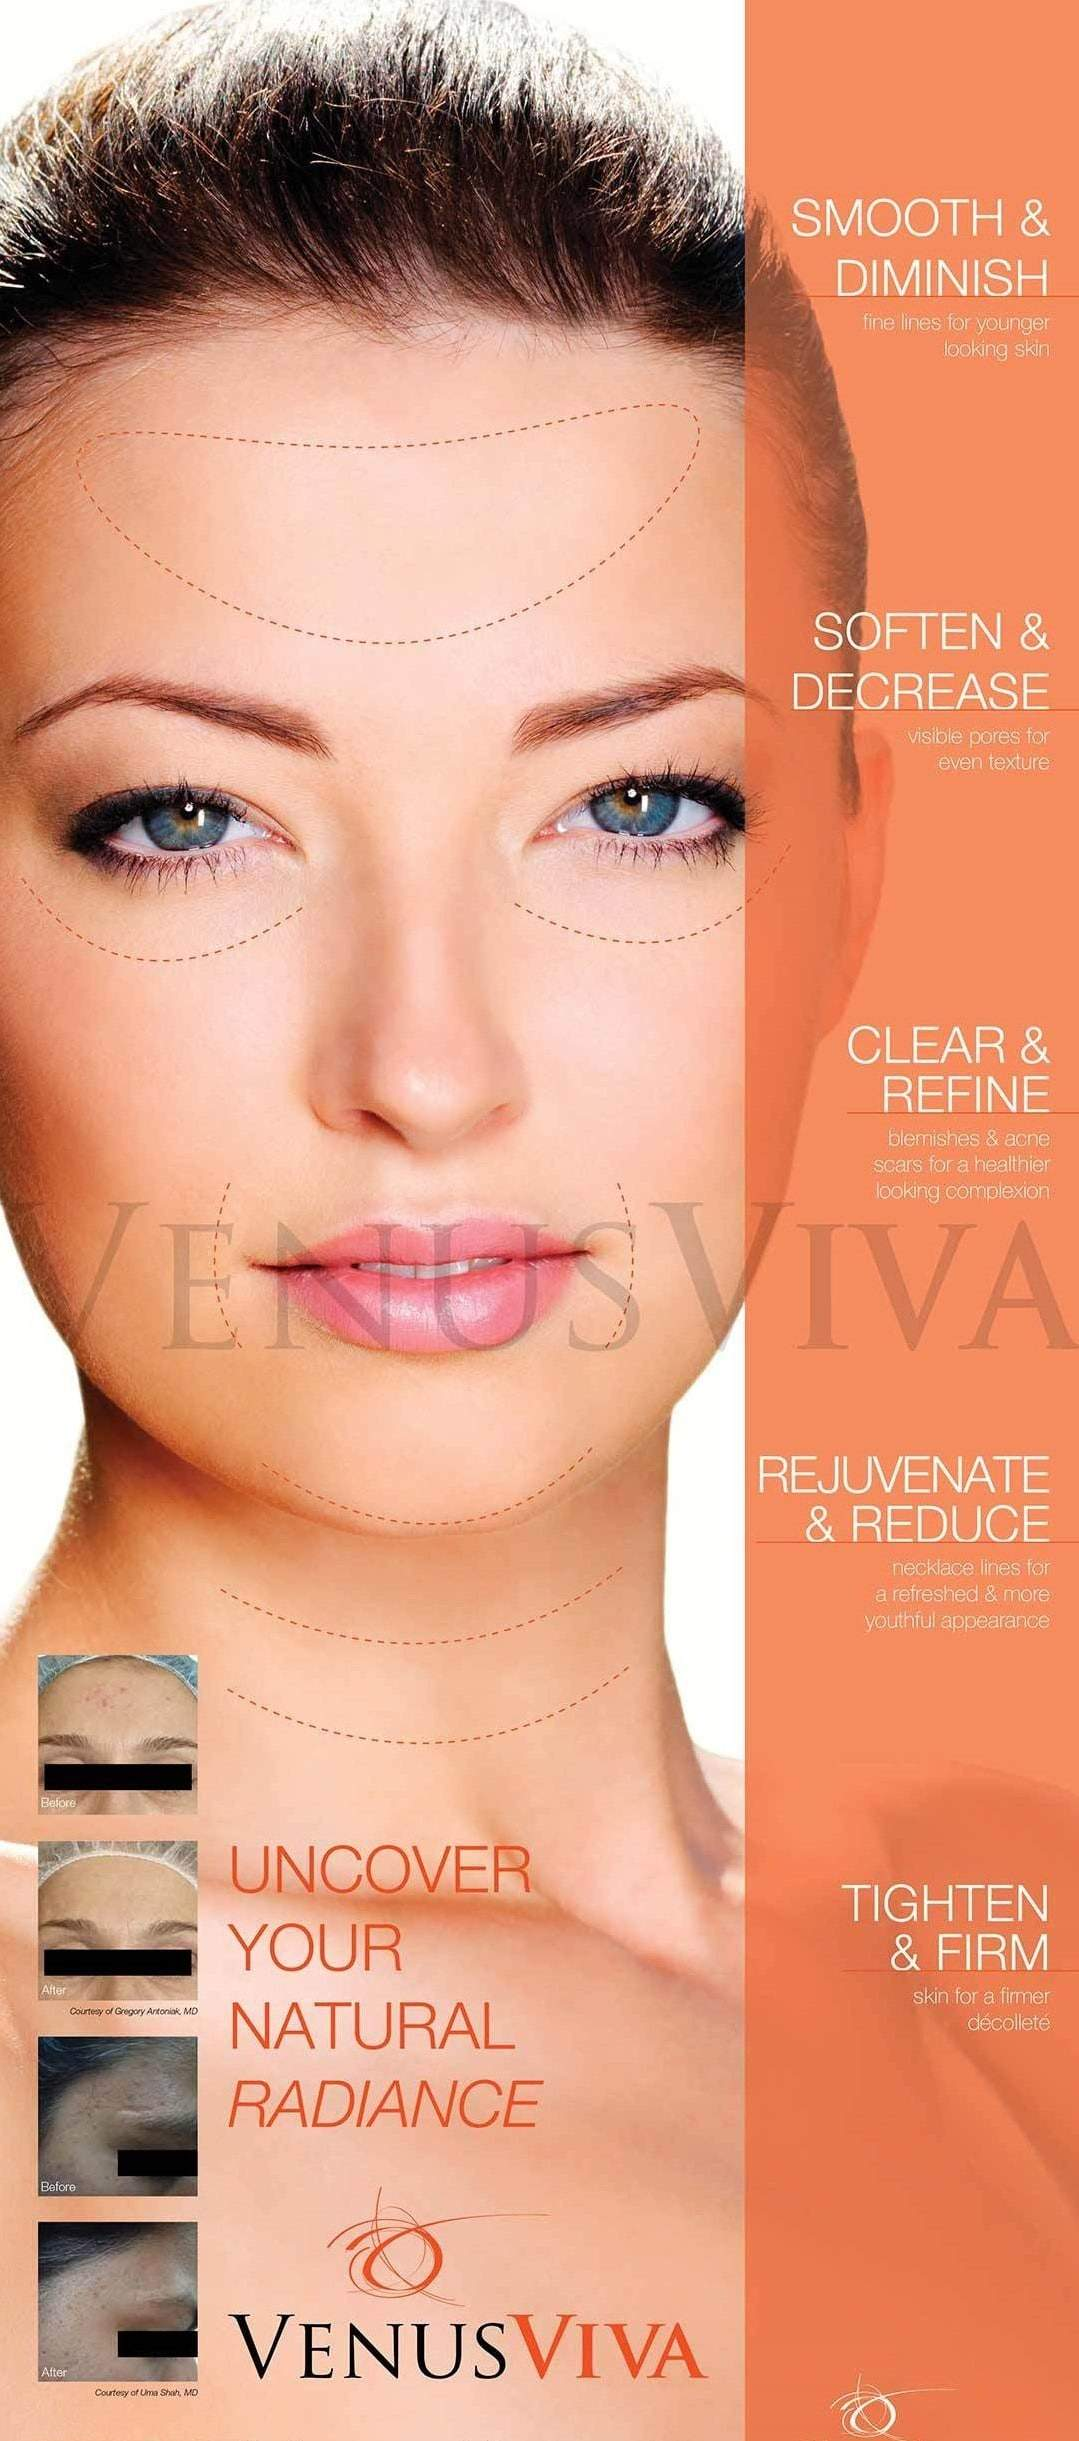 AgeLess InSkin Laser & Body Venus Viva Diamond Polar RF